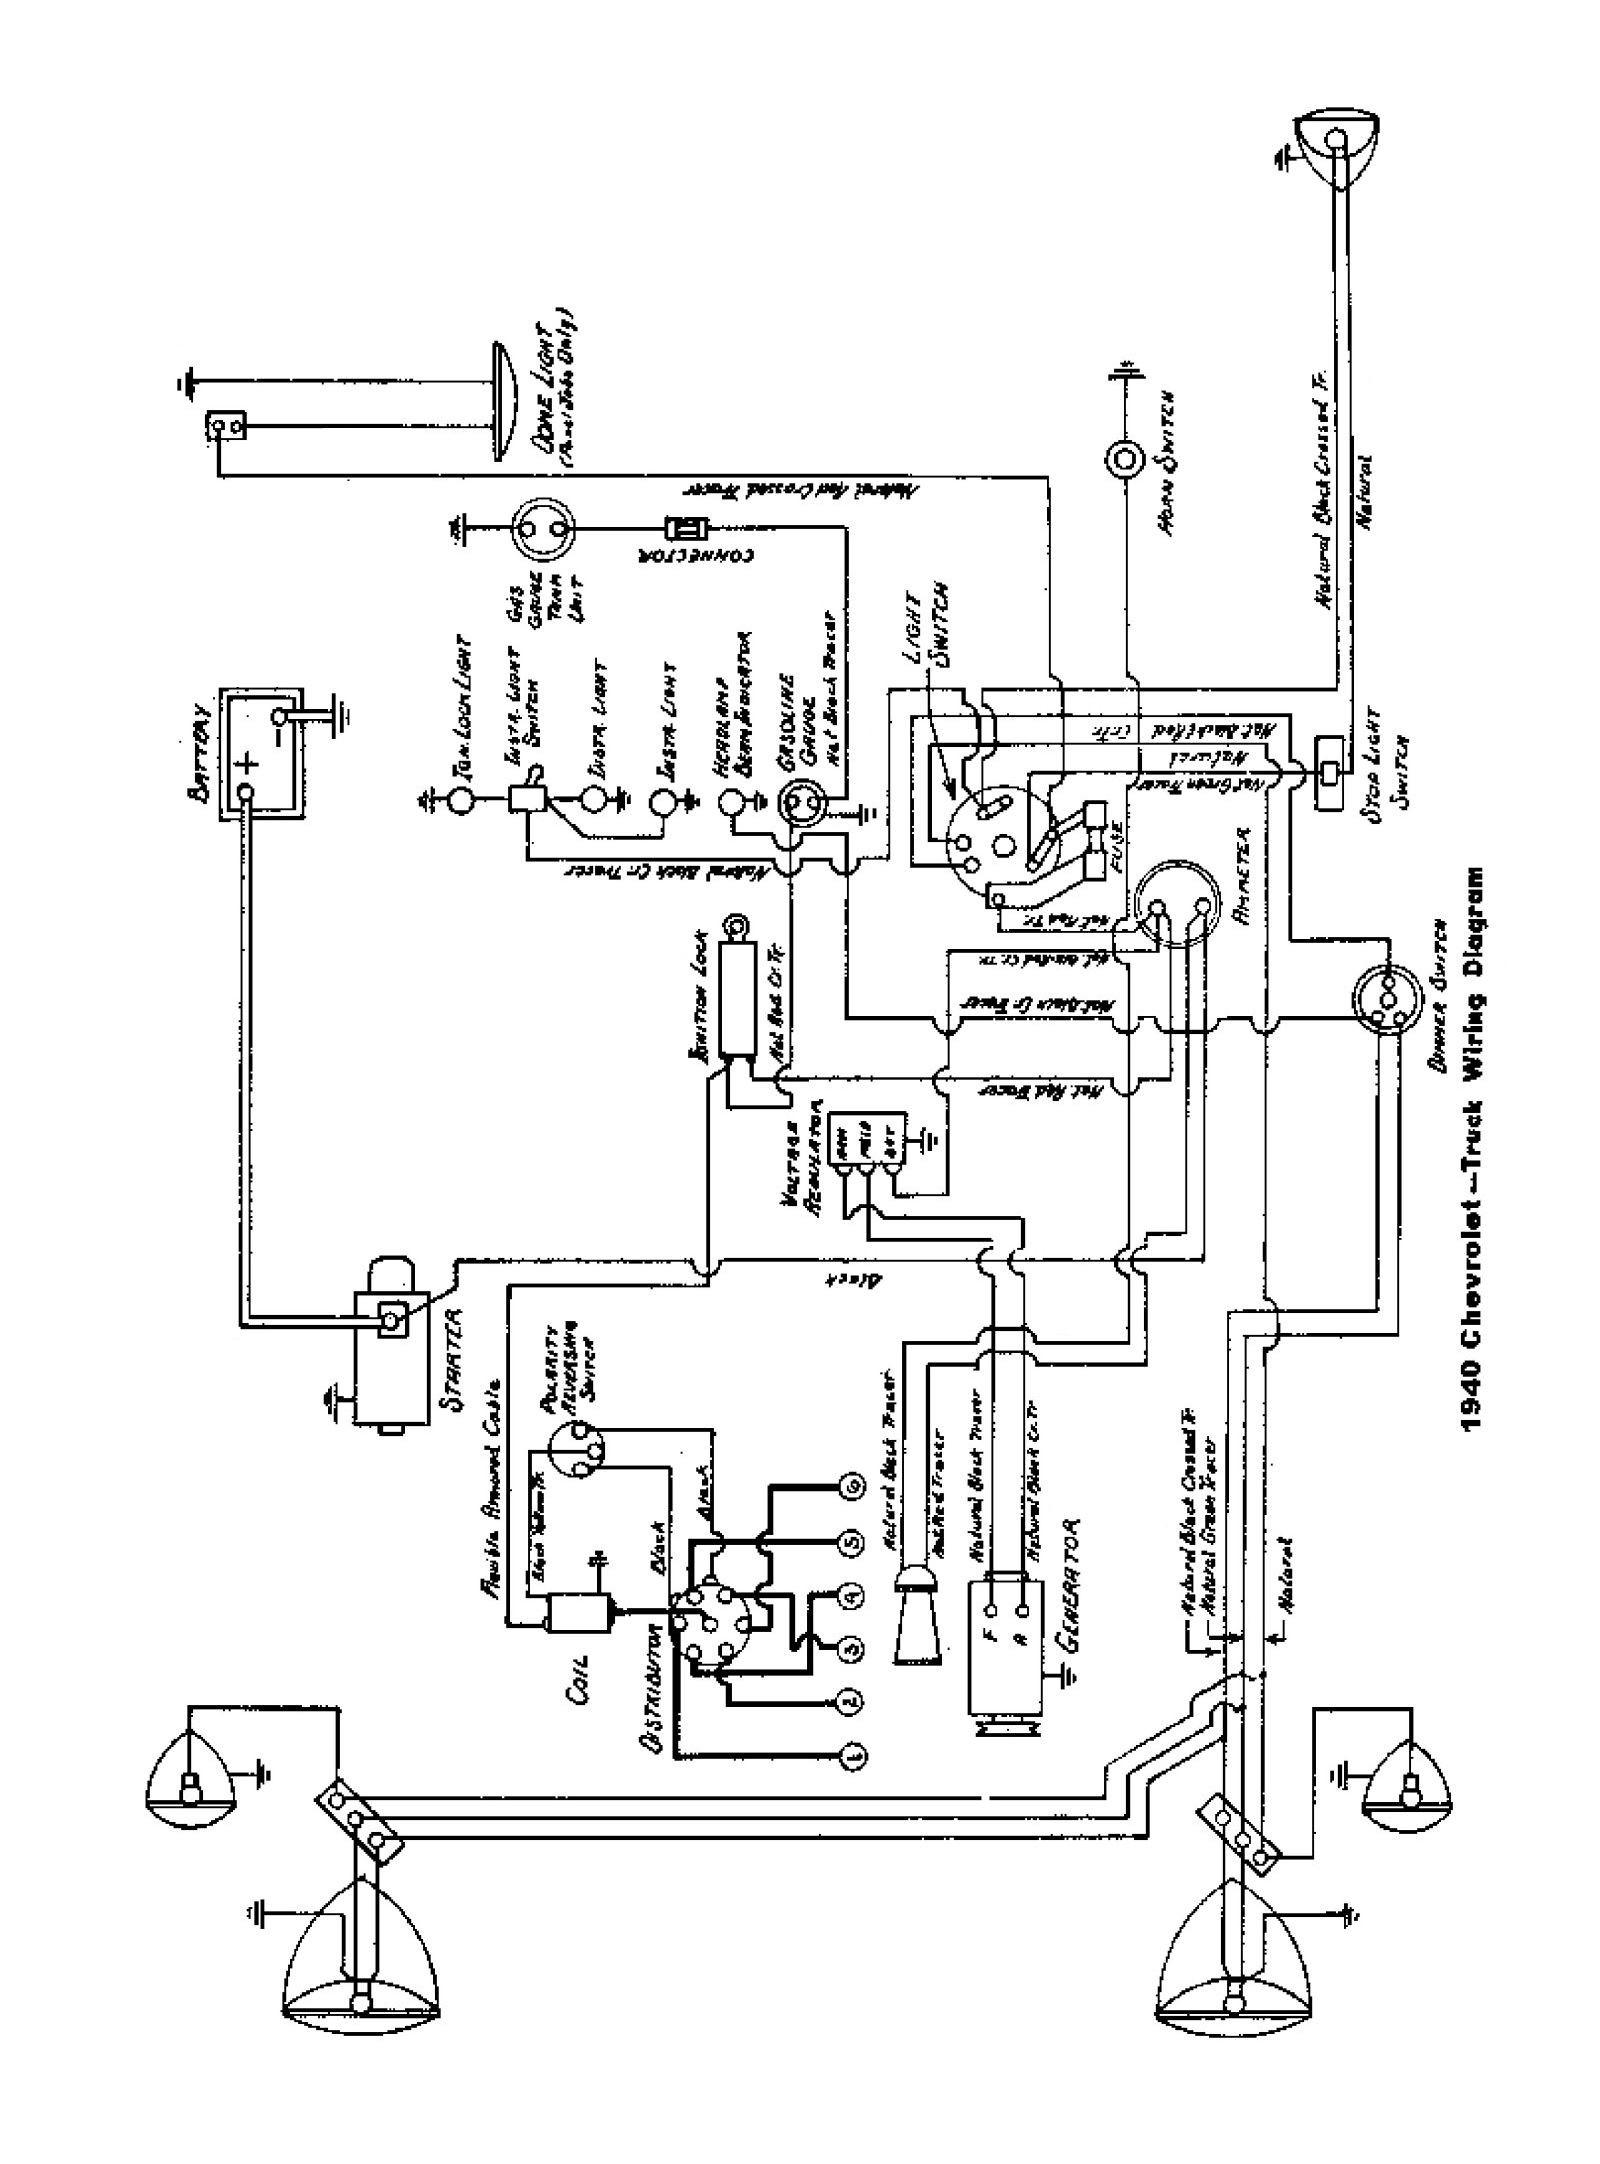 Chevy Truck Wiring Diagram Chevy Wiring Diagrams Of Chevy Truck Wiring Diagram